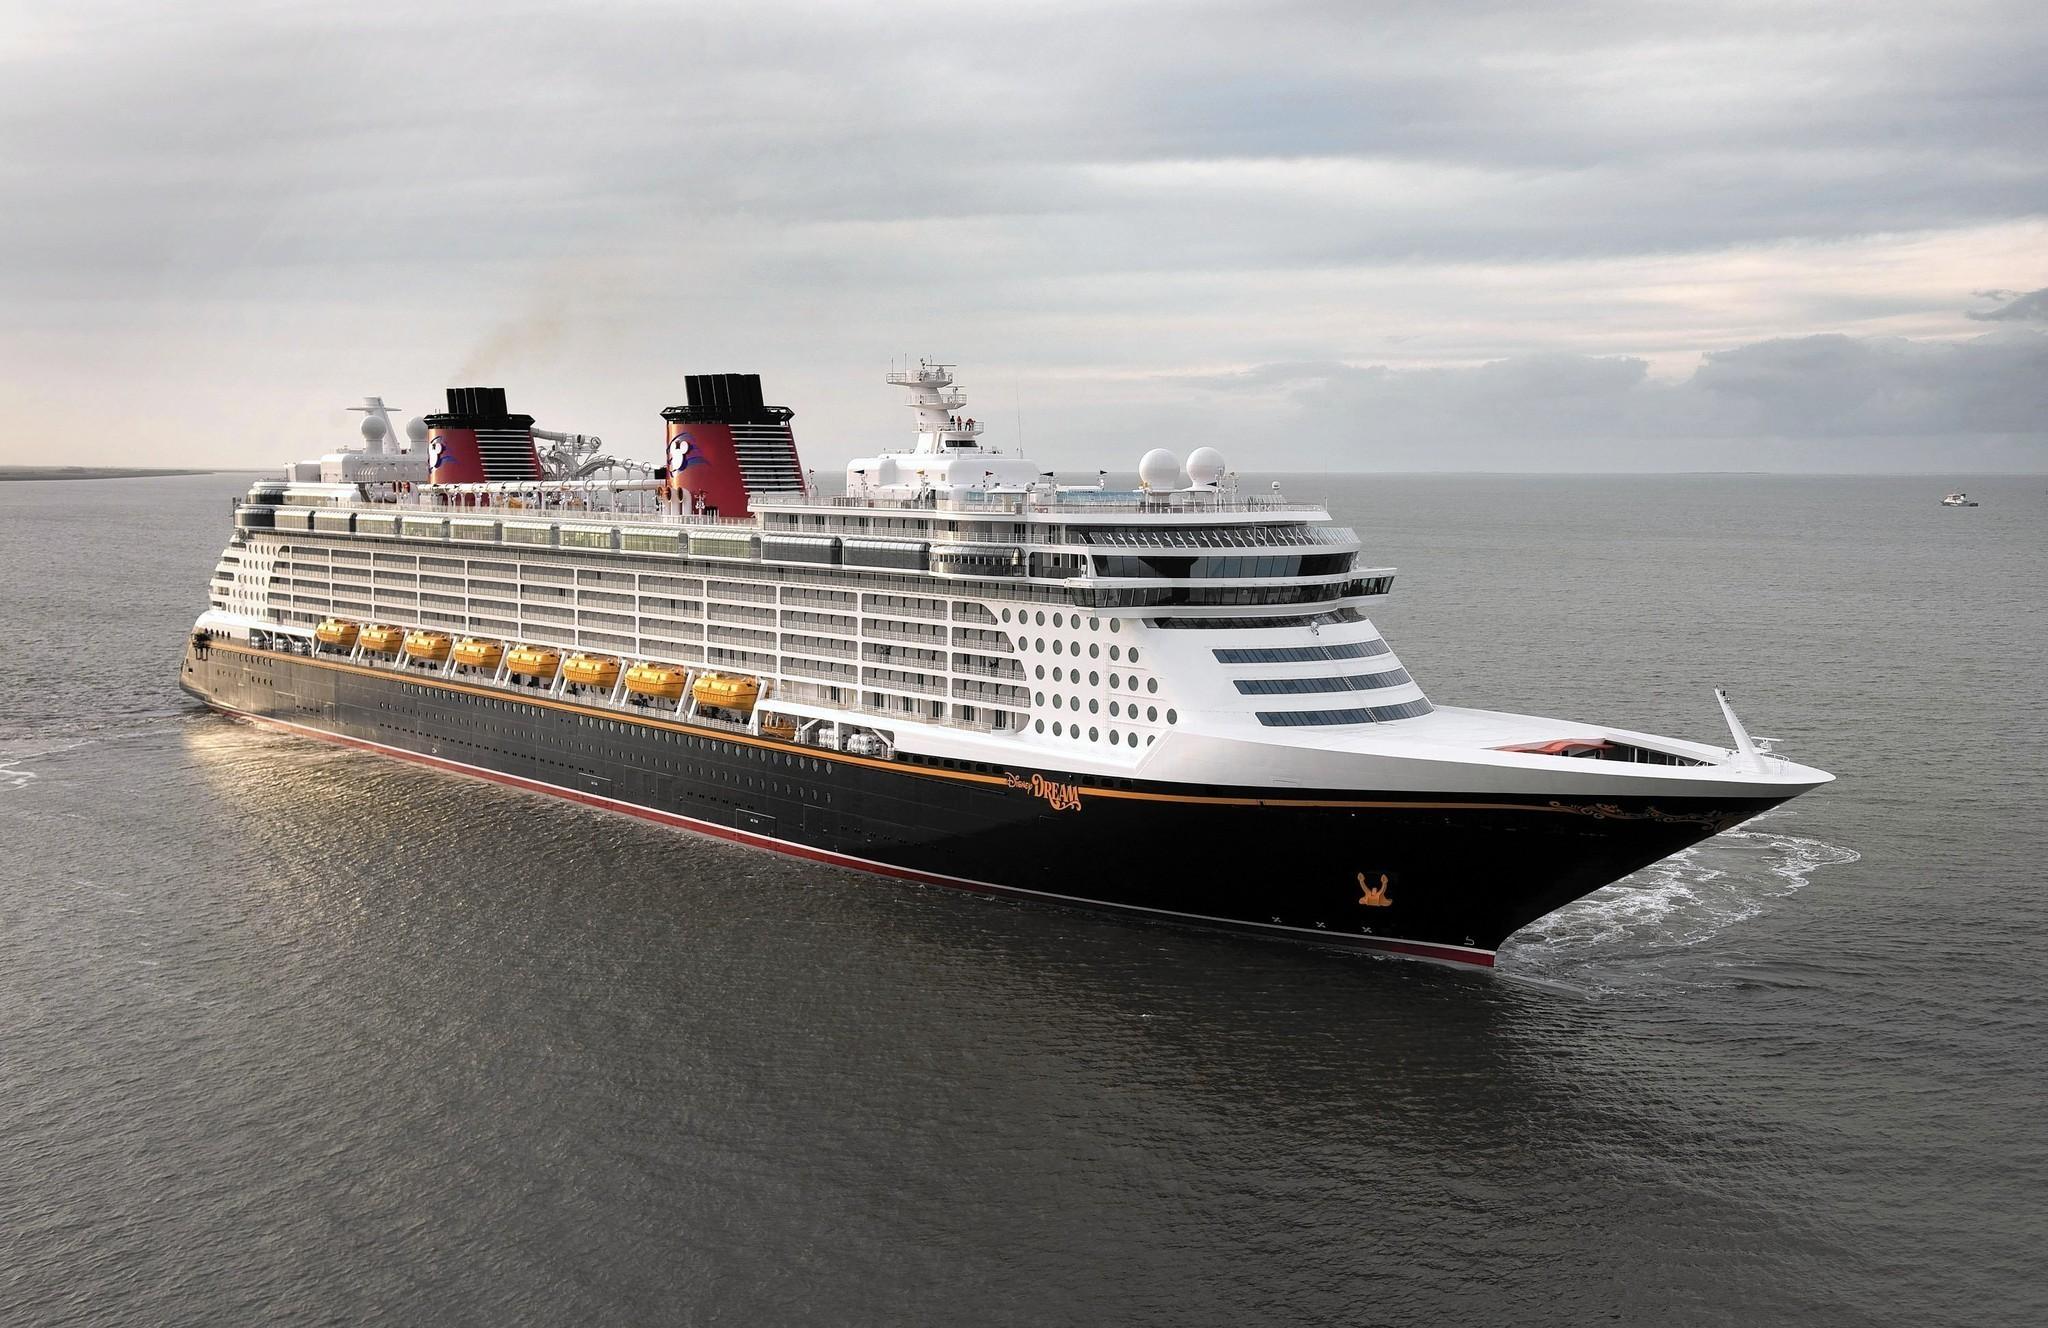 Disney plans to build 2 new cruise ships - Baltimore Sun